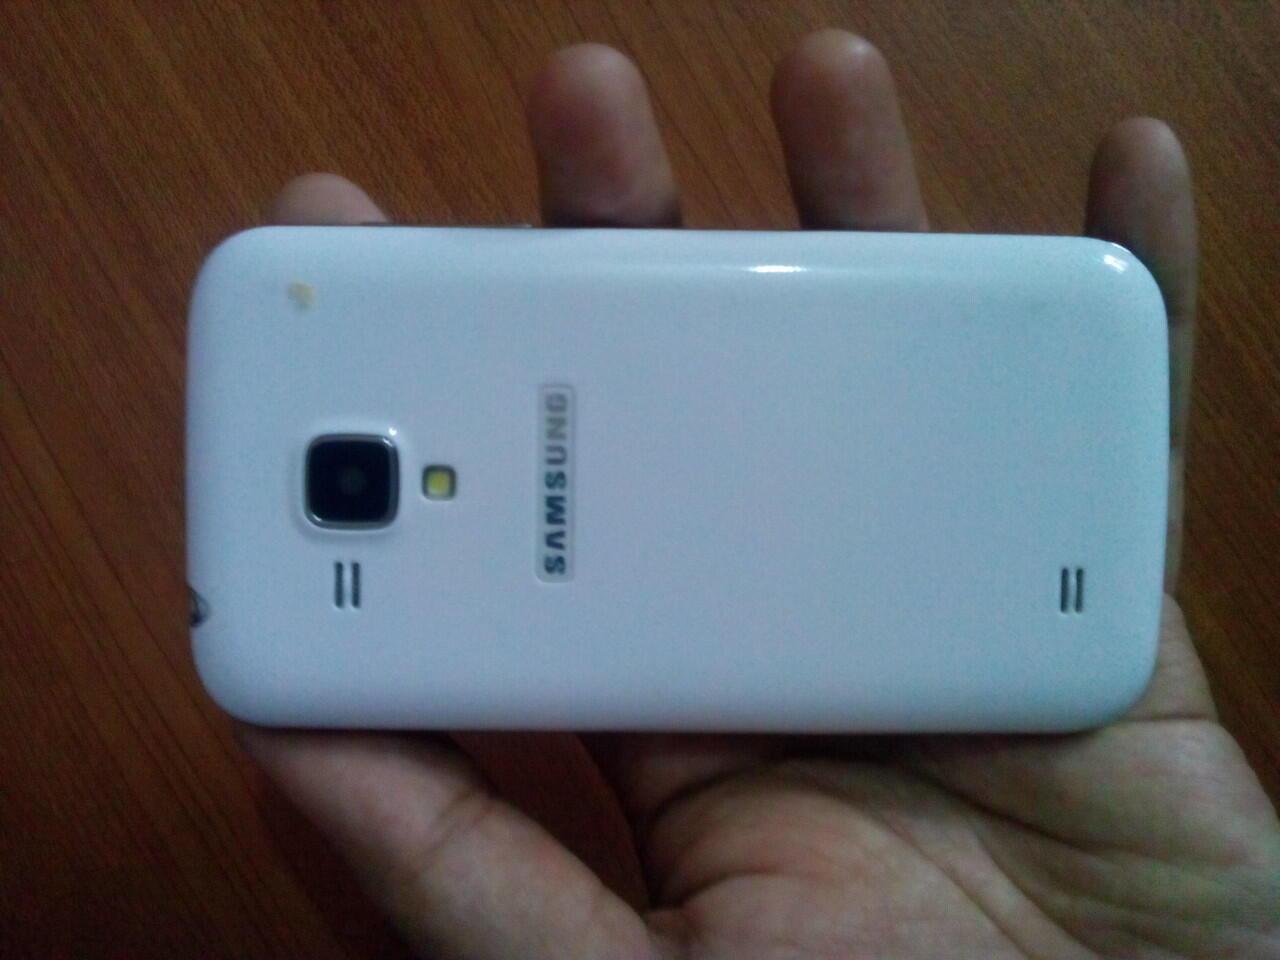 Samsung Galaxy SIV Mini supercopy